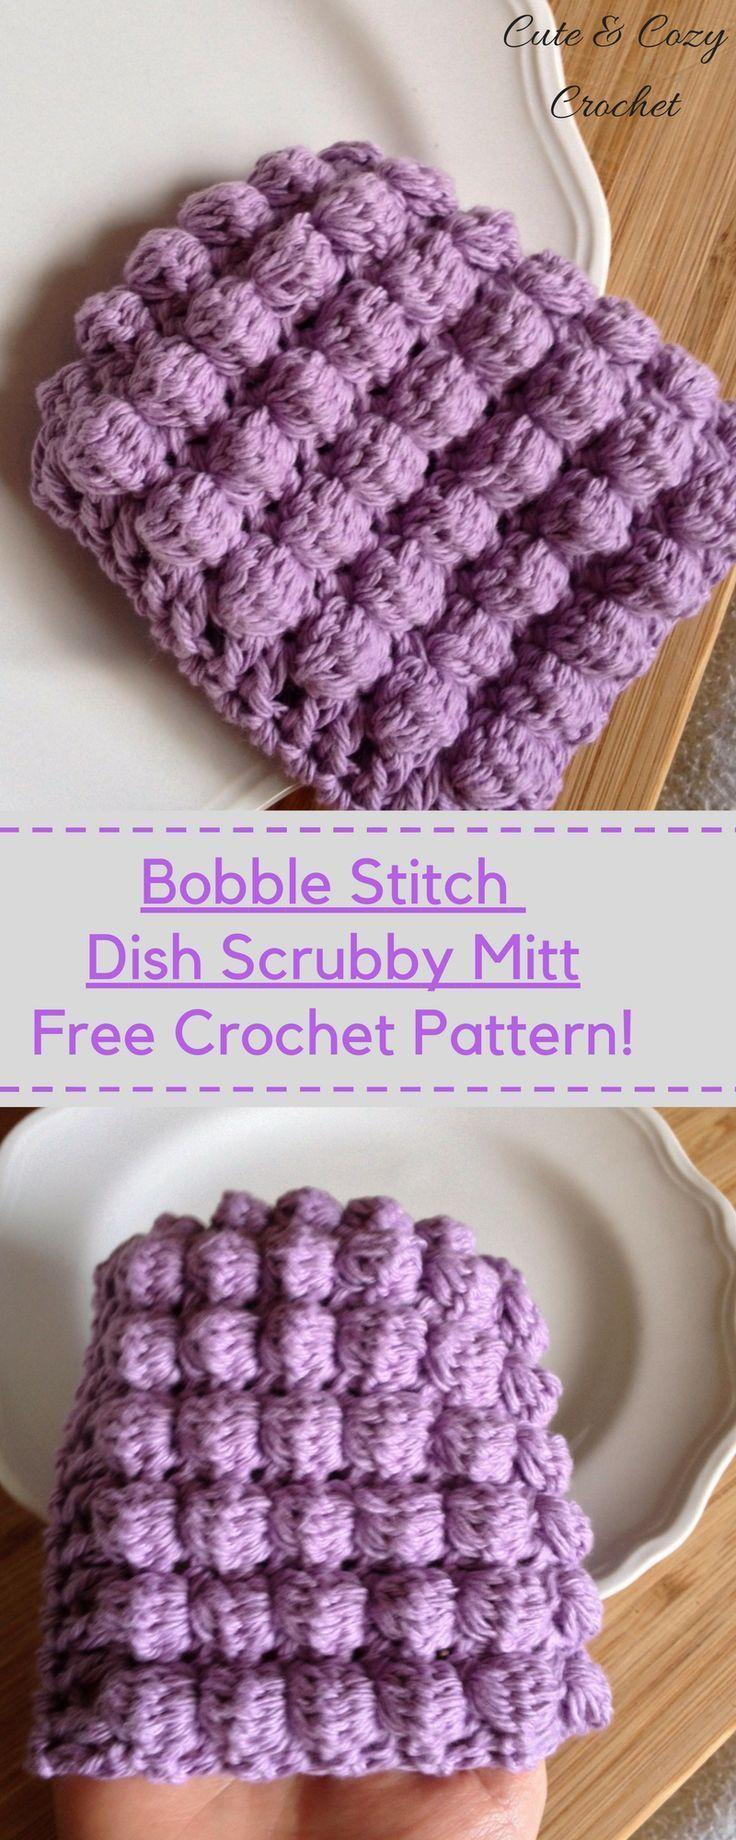 Bobble stitch dish scrubby mitt bobble stitch free crochet and bobble stitch dish scrubby mitt bankloansurffo Gallery